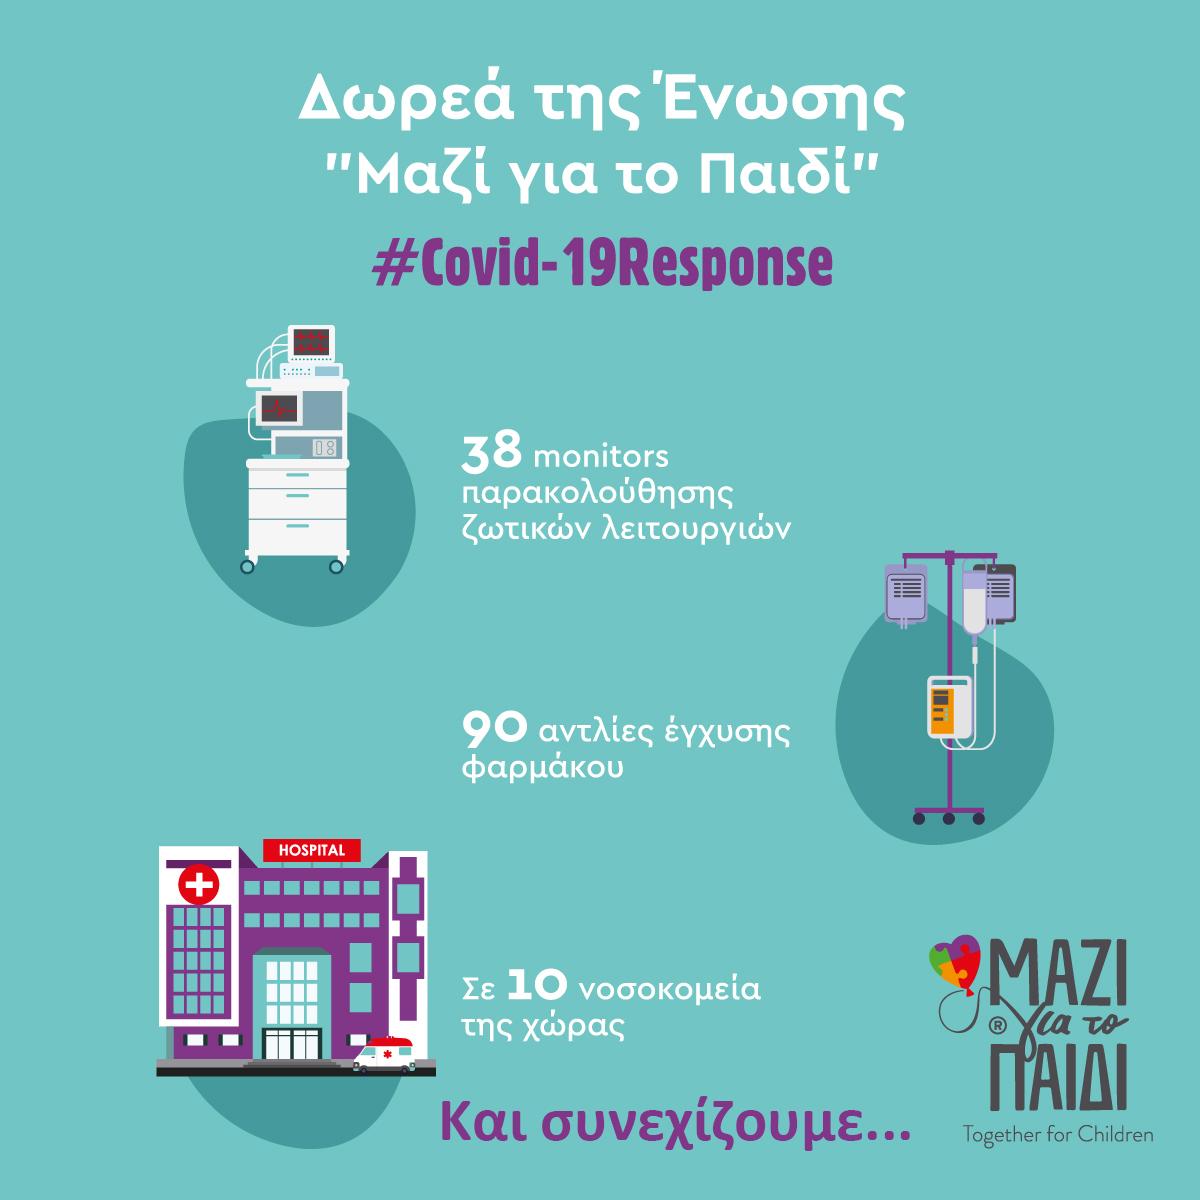 mazigiatopaidi COVID 19 Response Infographic Social Media v2 revised2 1